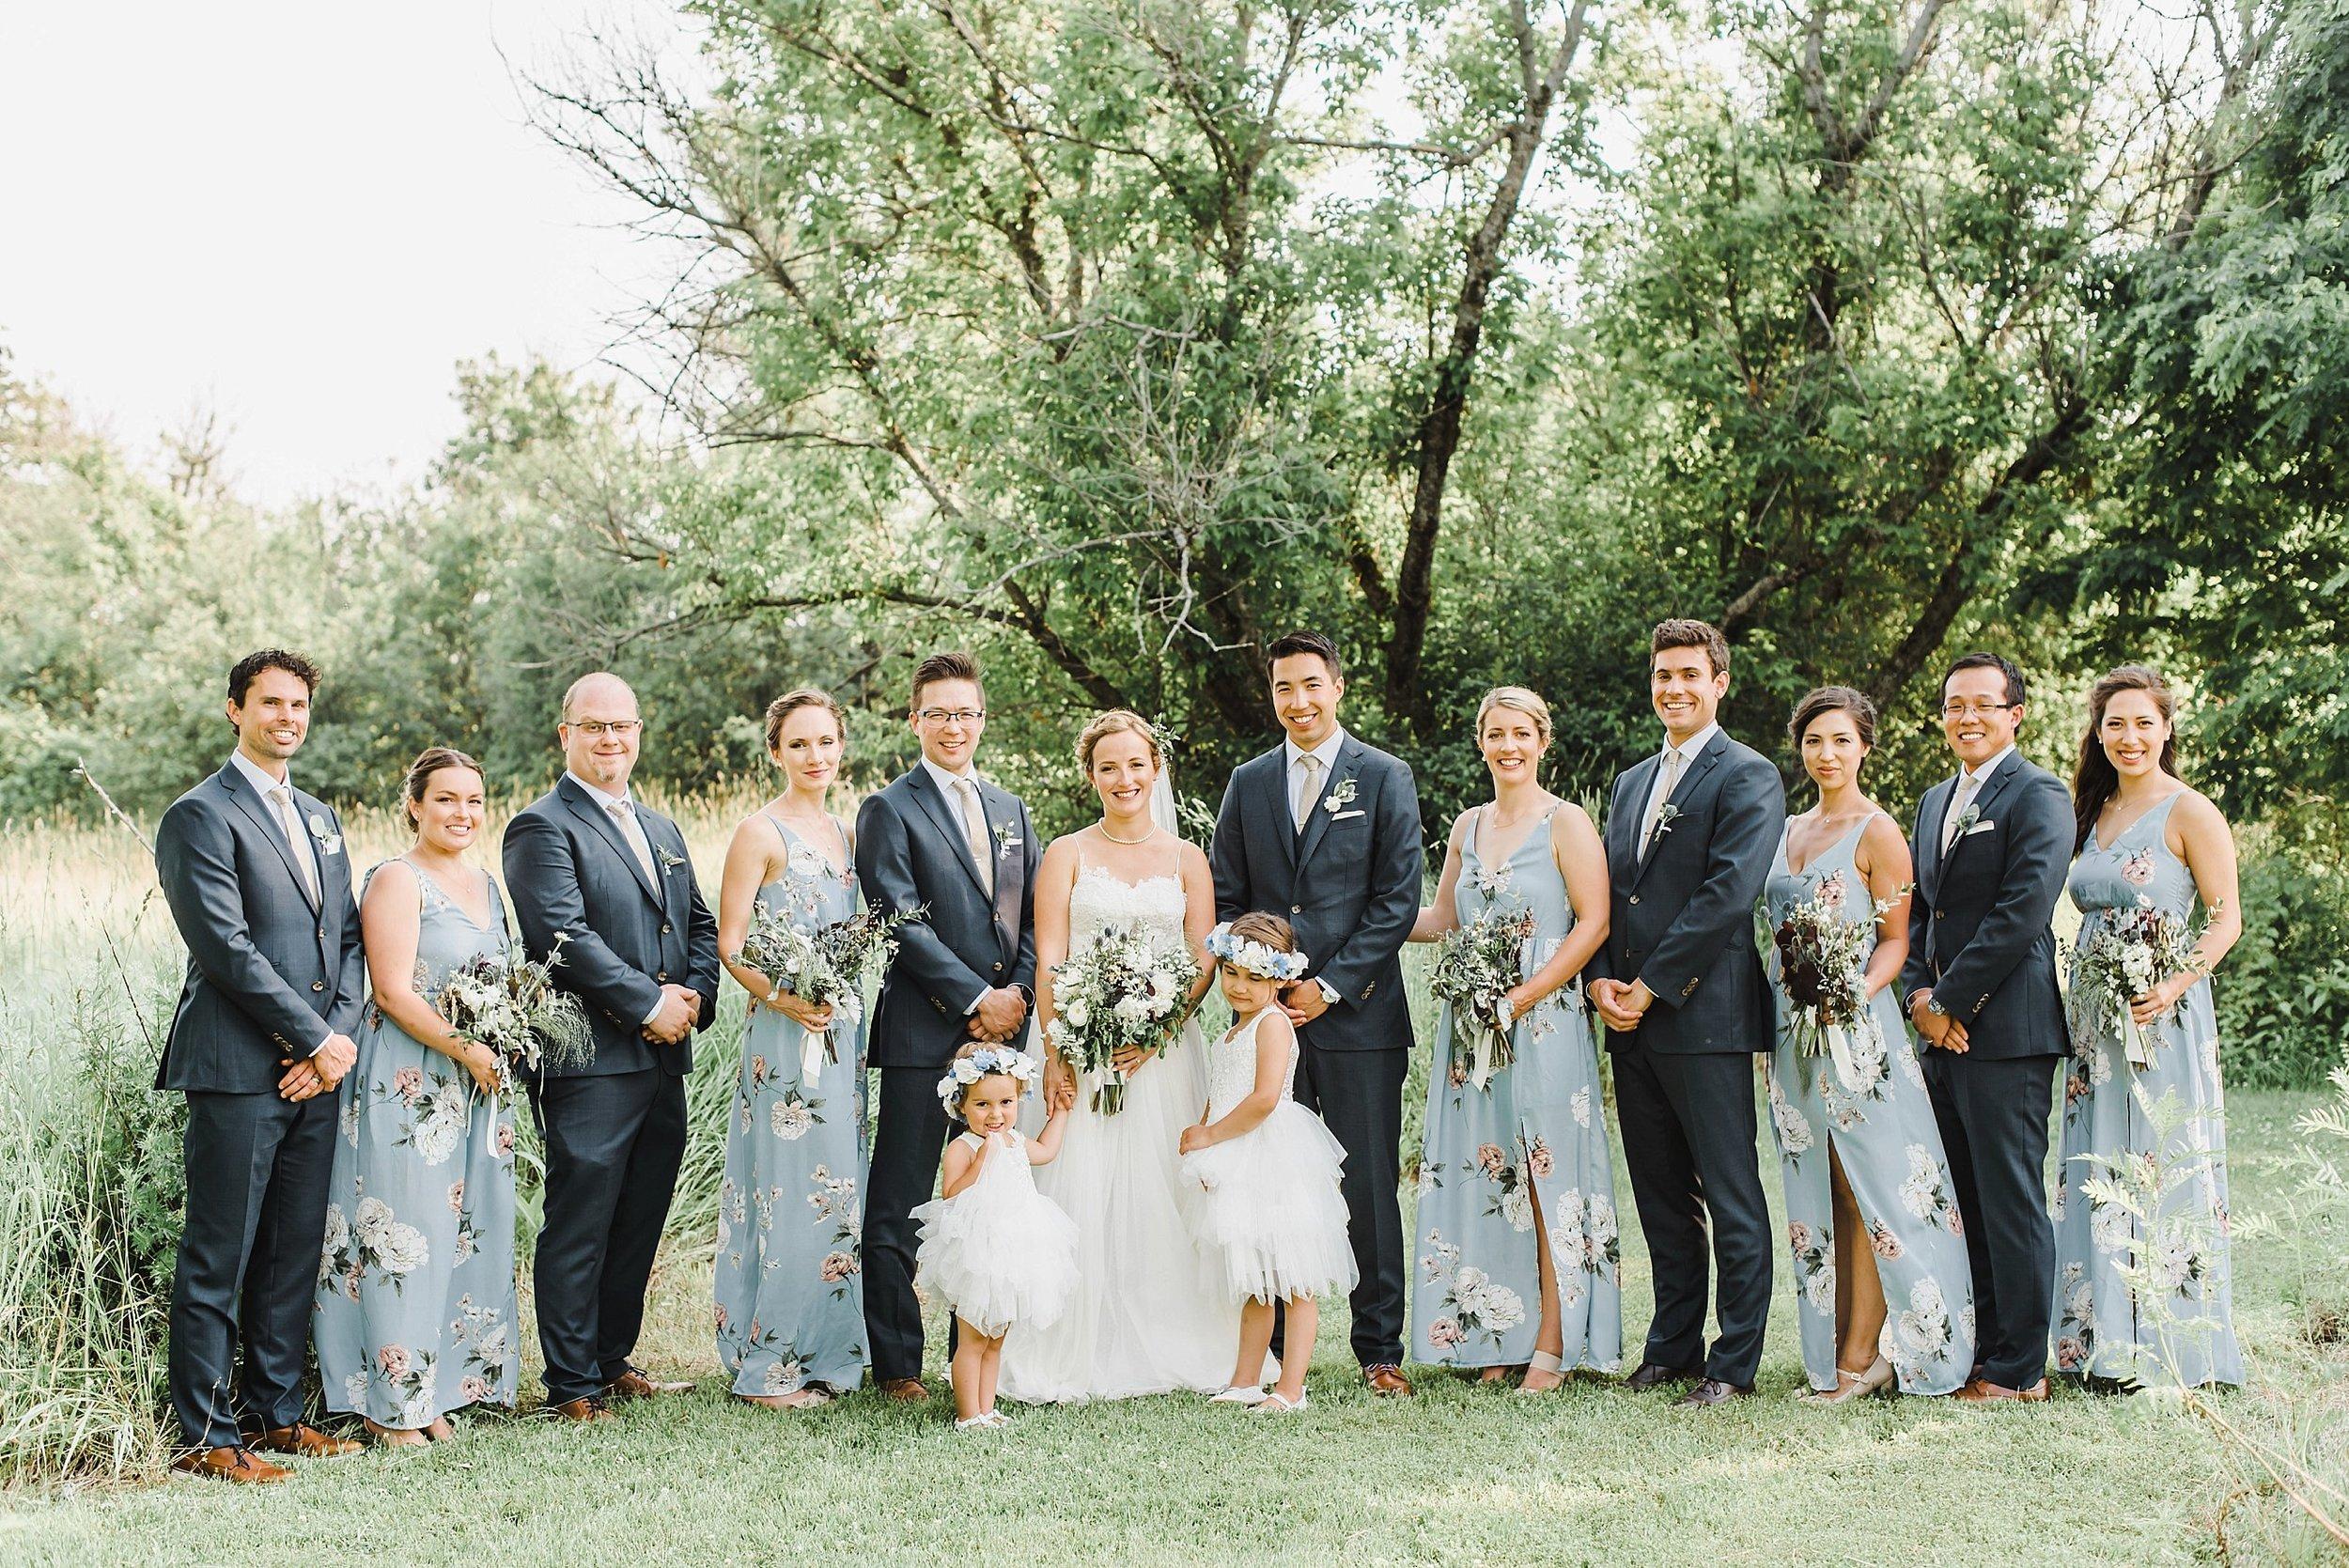 light airy indie fine art ottawa wedding photographer | Ali and Batoul Photography_0826.jpg